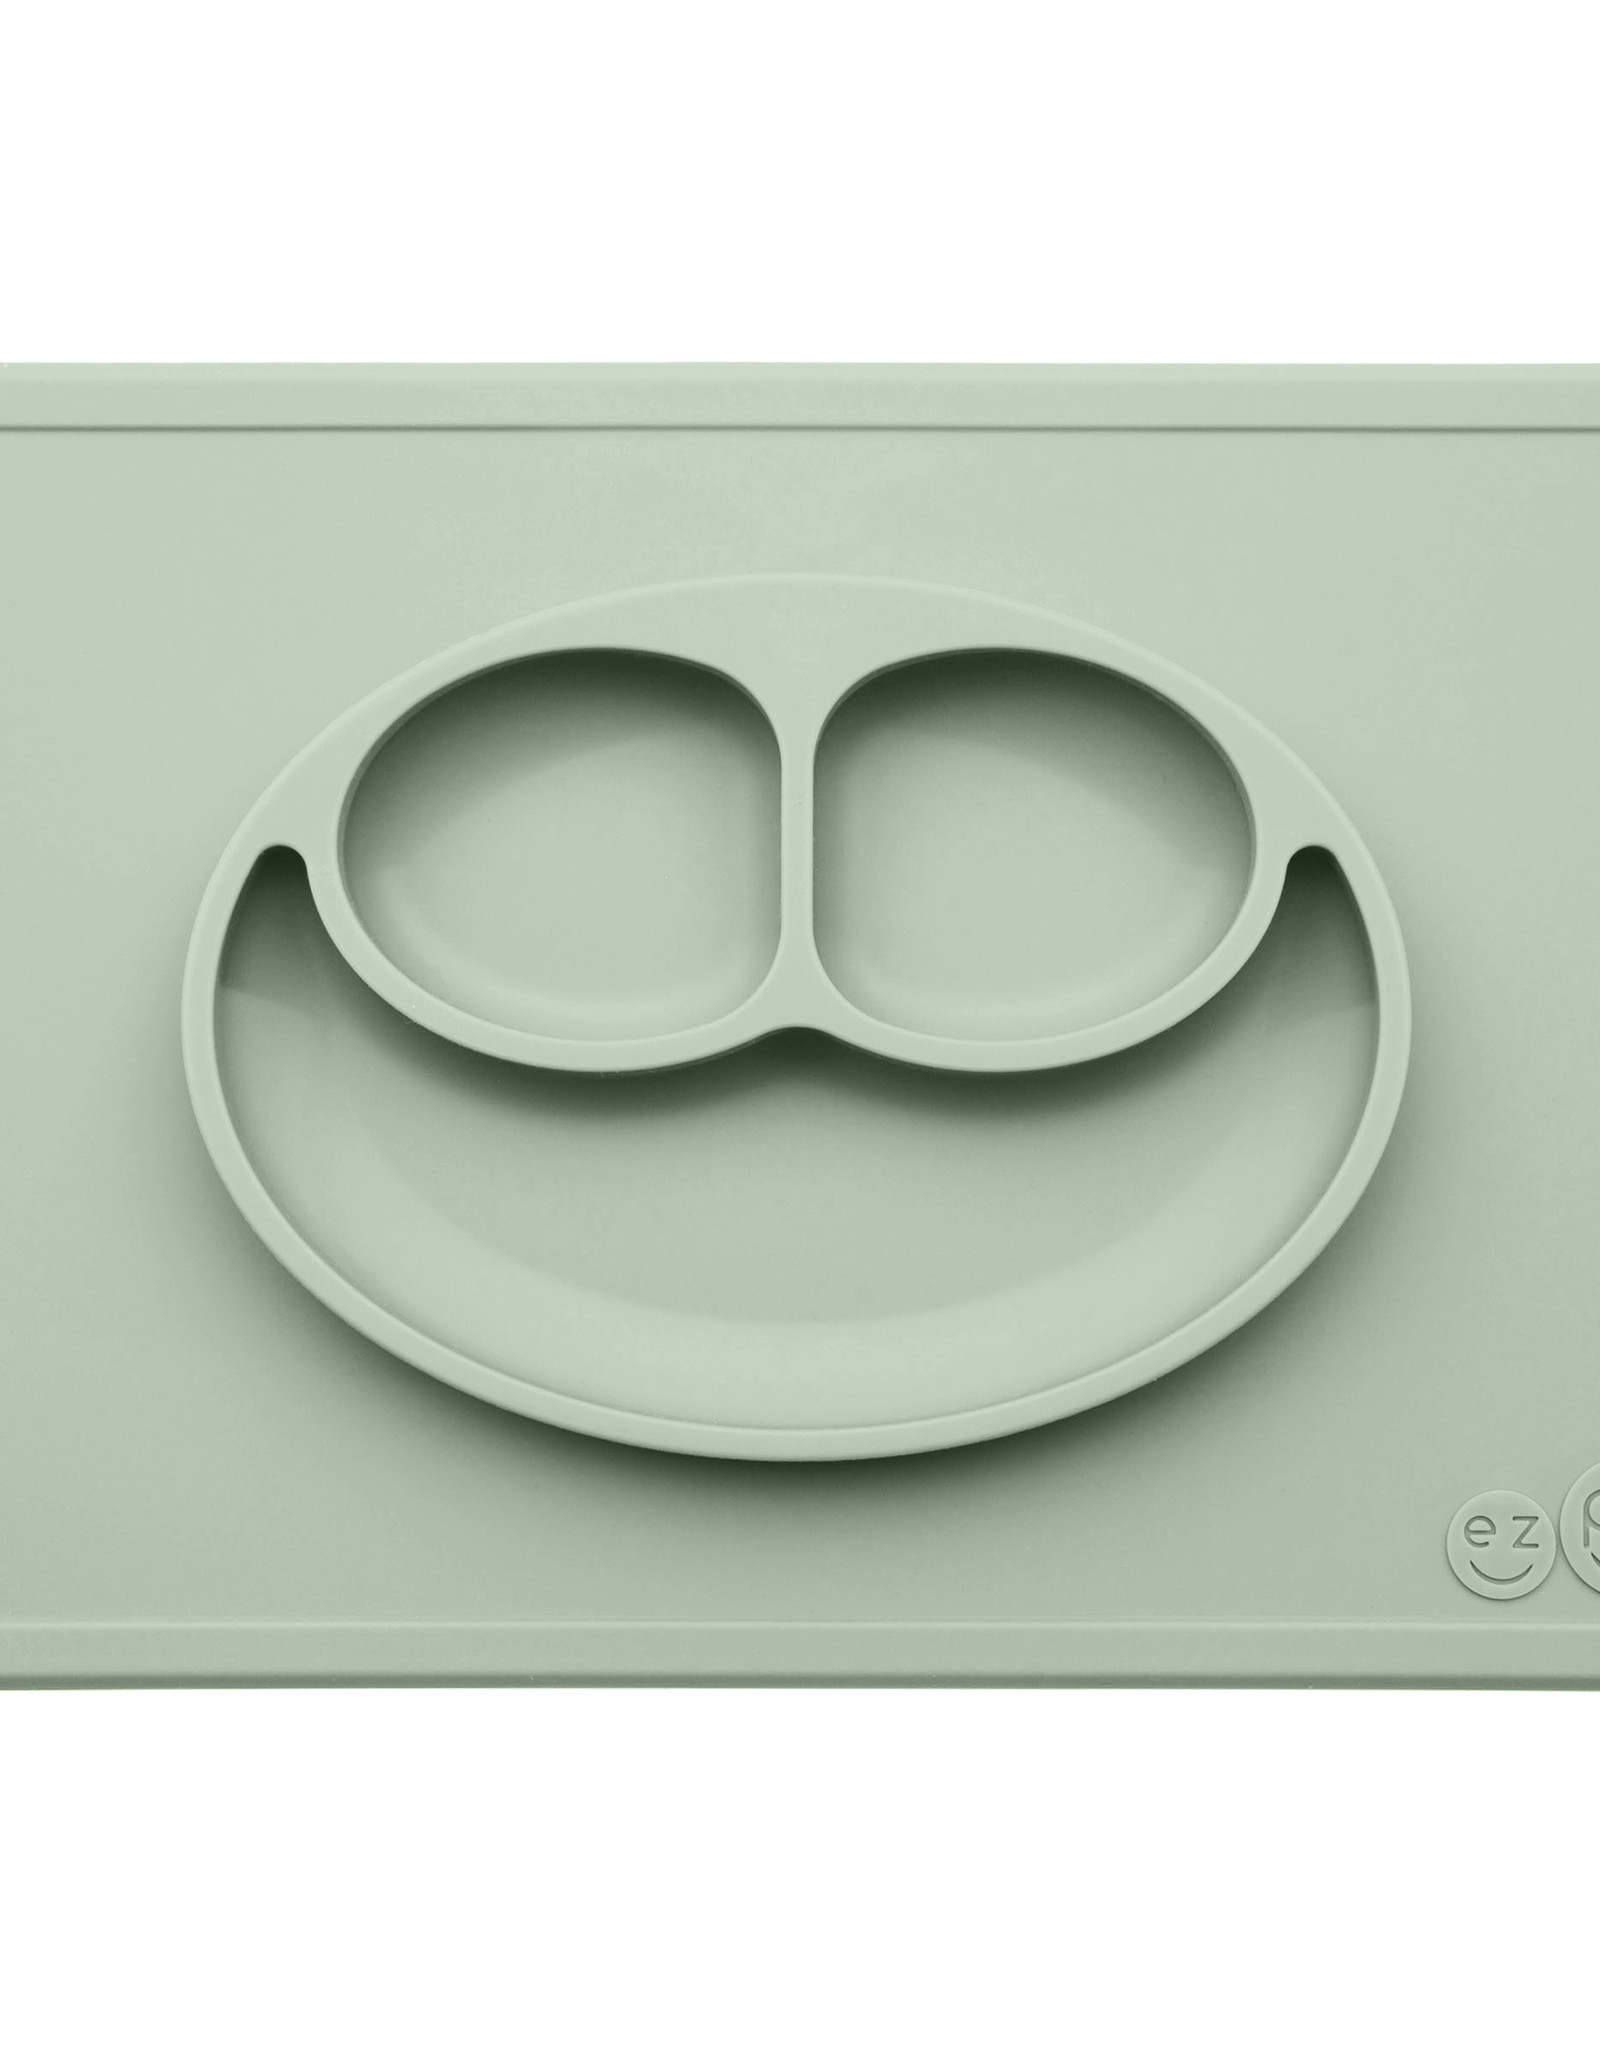 EZPZ Happy mat - Sage